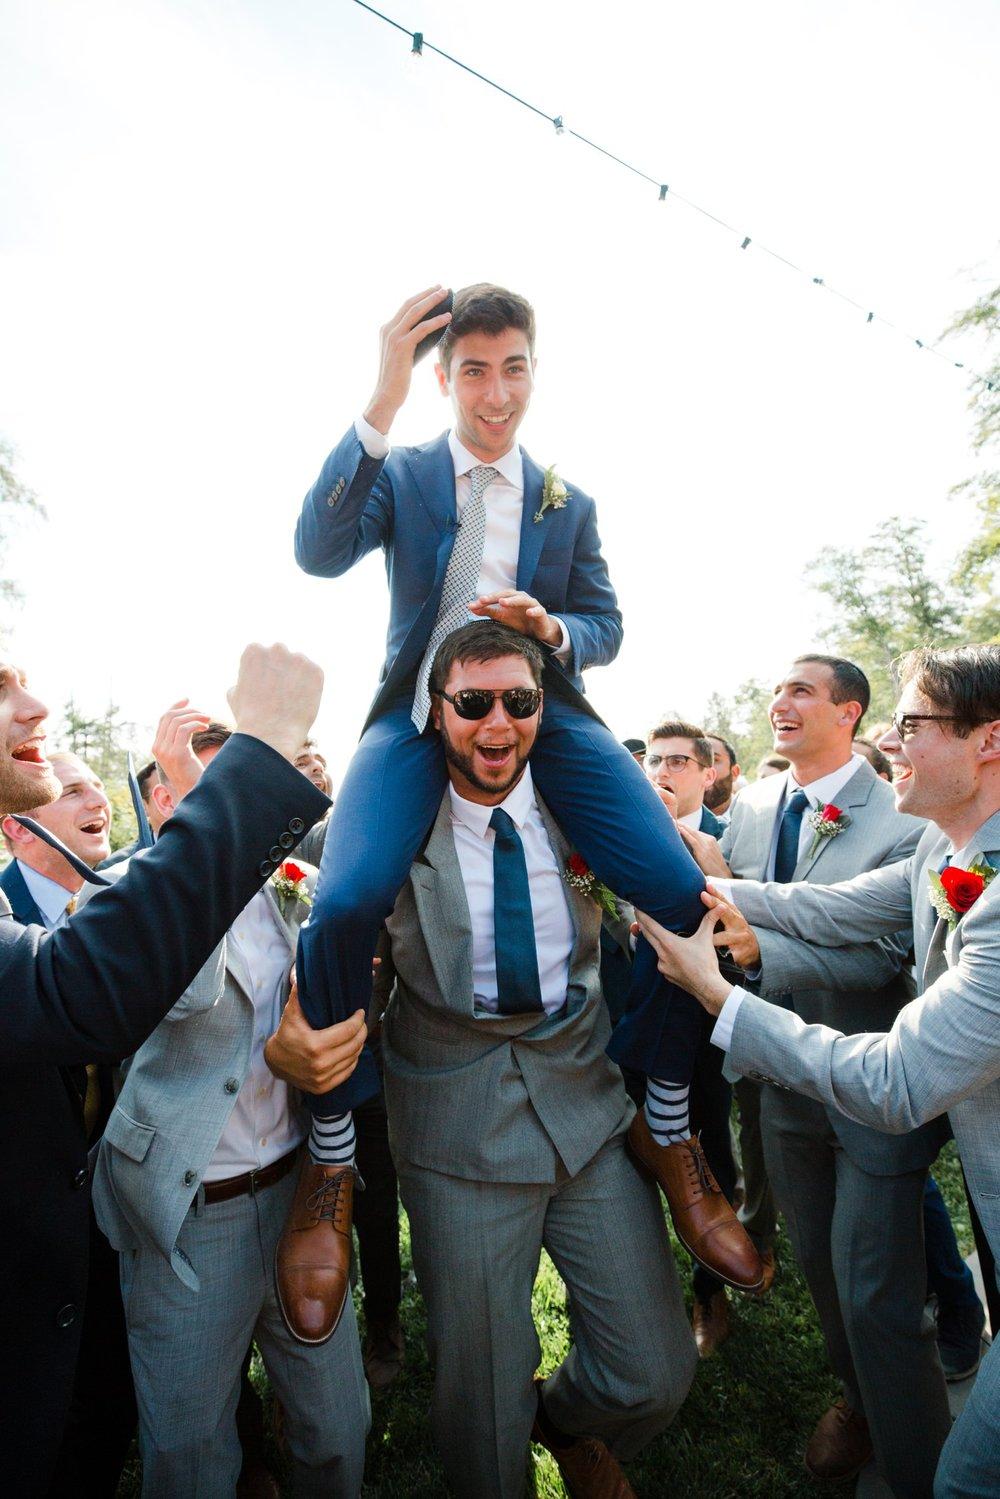 normandy-park-wedding-seattle-photographer.jpg